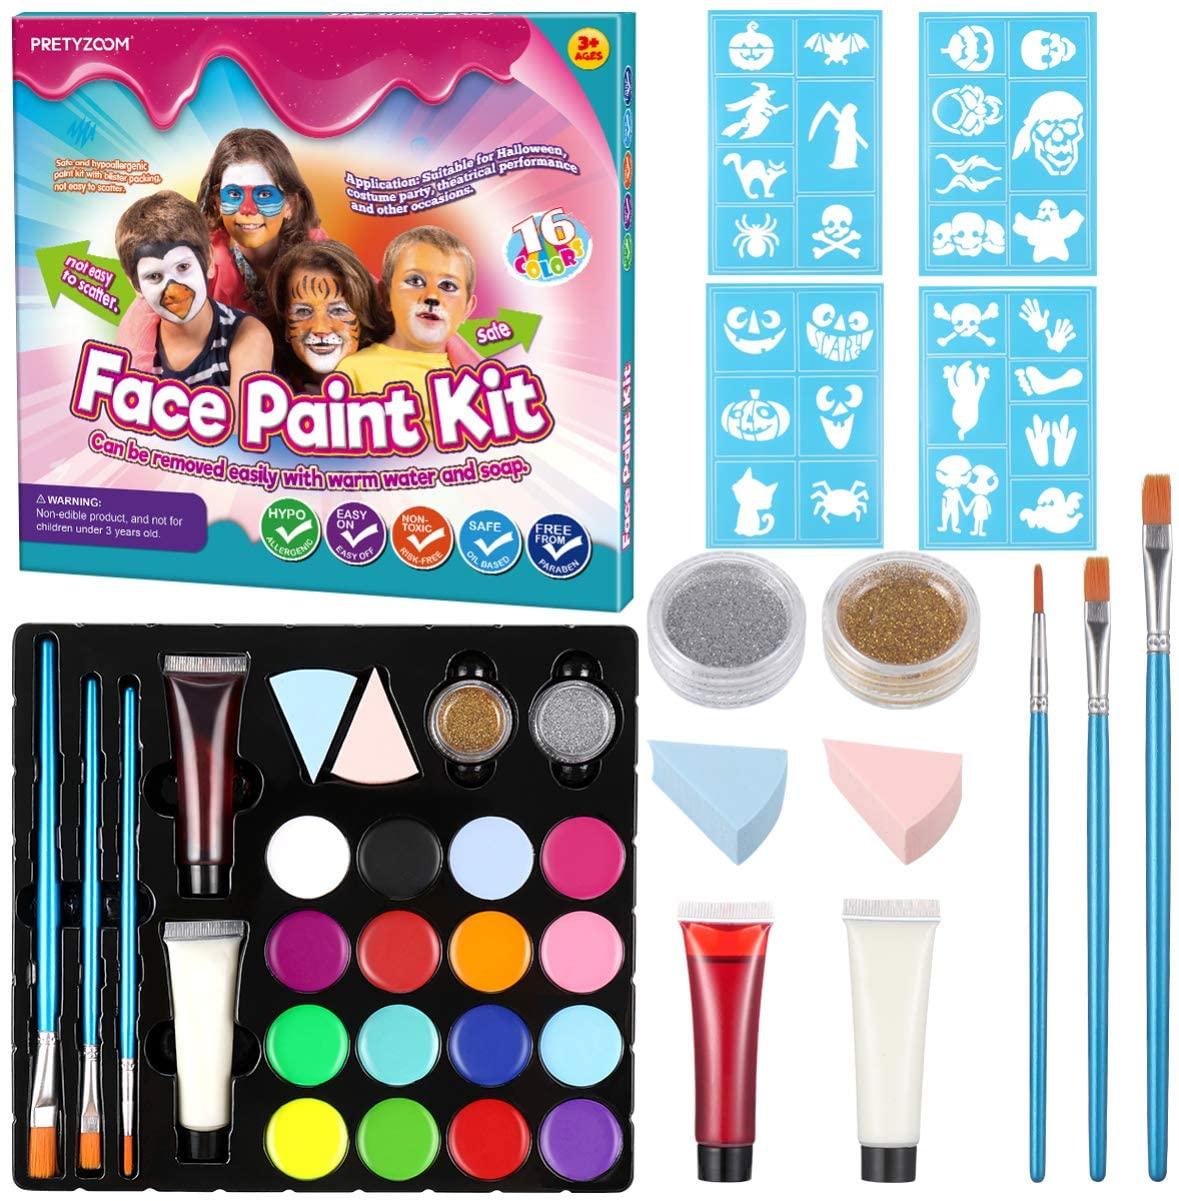 PRETYZOOM Face Paint Kit Halloween Professional Face Paint Palette with Blush Glitter Box Halloween Sticker Cosplay Makeup Facepaint Set for Kids Masquerade Halloween Facepaint Party Supplies